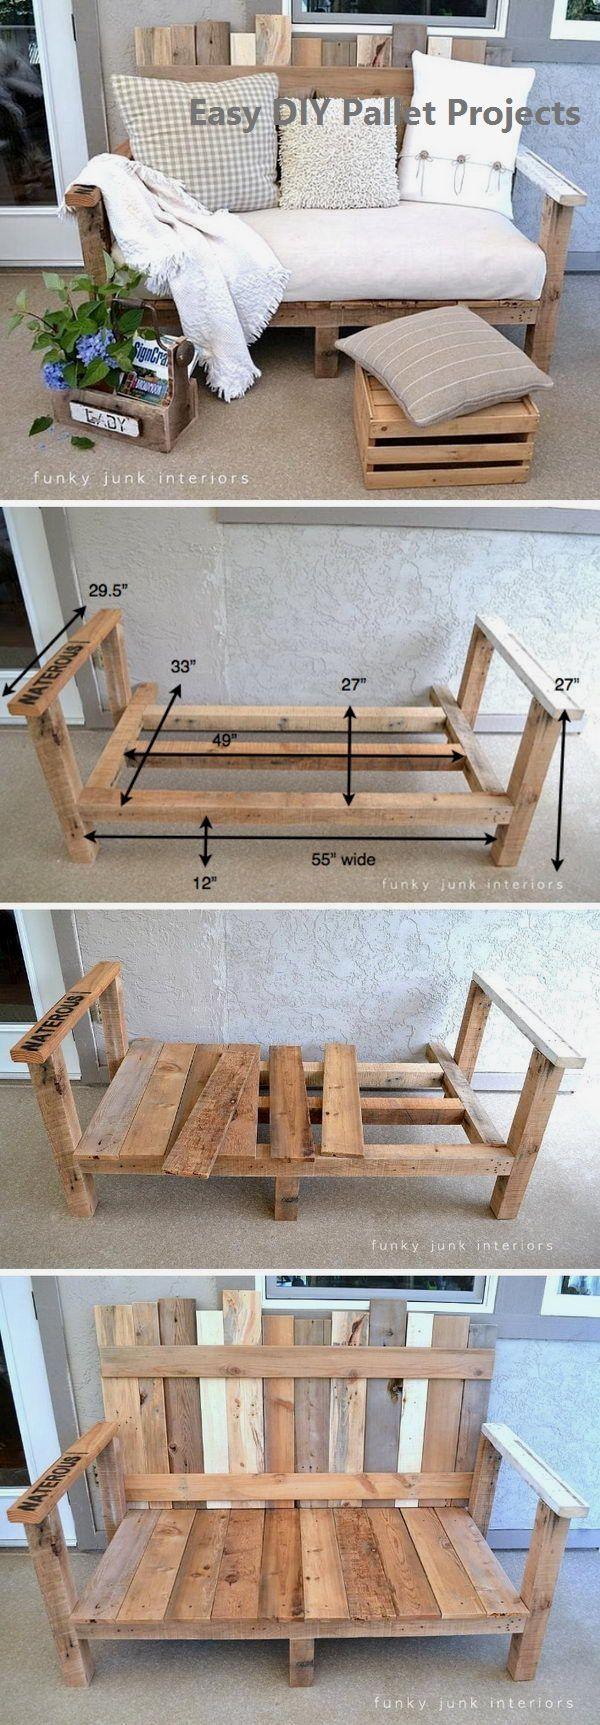 DIY ideas Using Wood Pallets